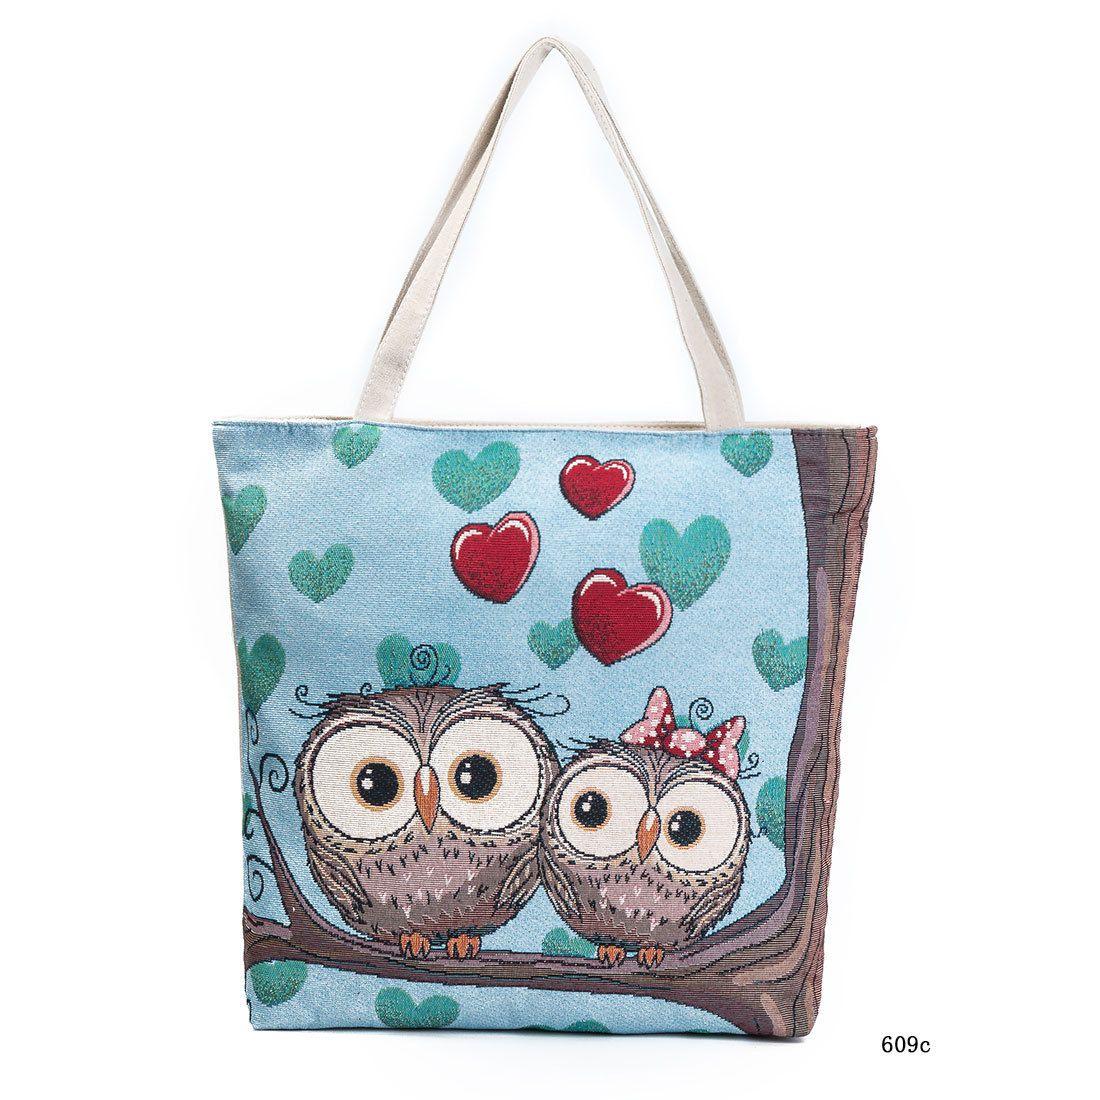 da2a7c42f9a8 Colorful Owl Printed Messenger Bag Female Small Shoulder Bags Women Animals  Flap Girls Fashion Crossbody Mini Package